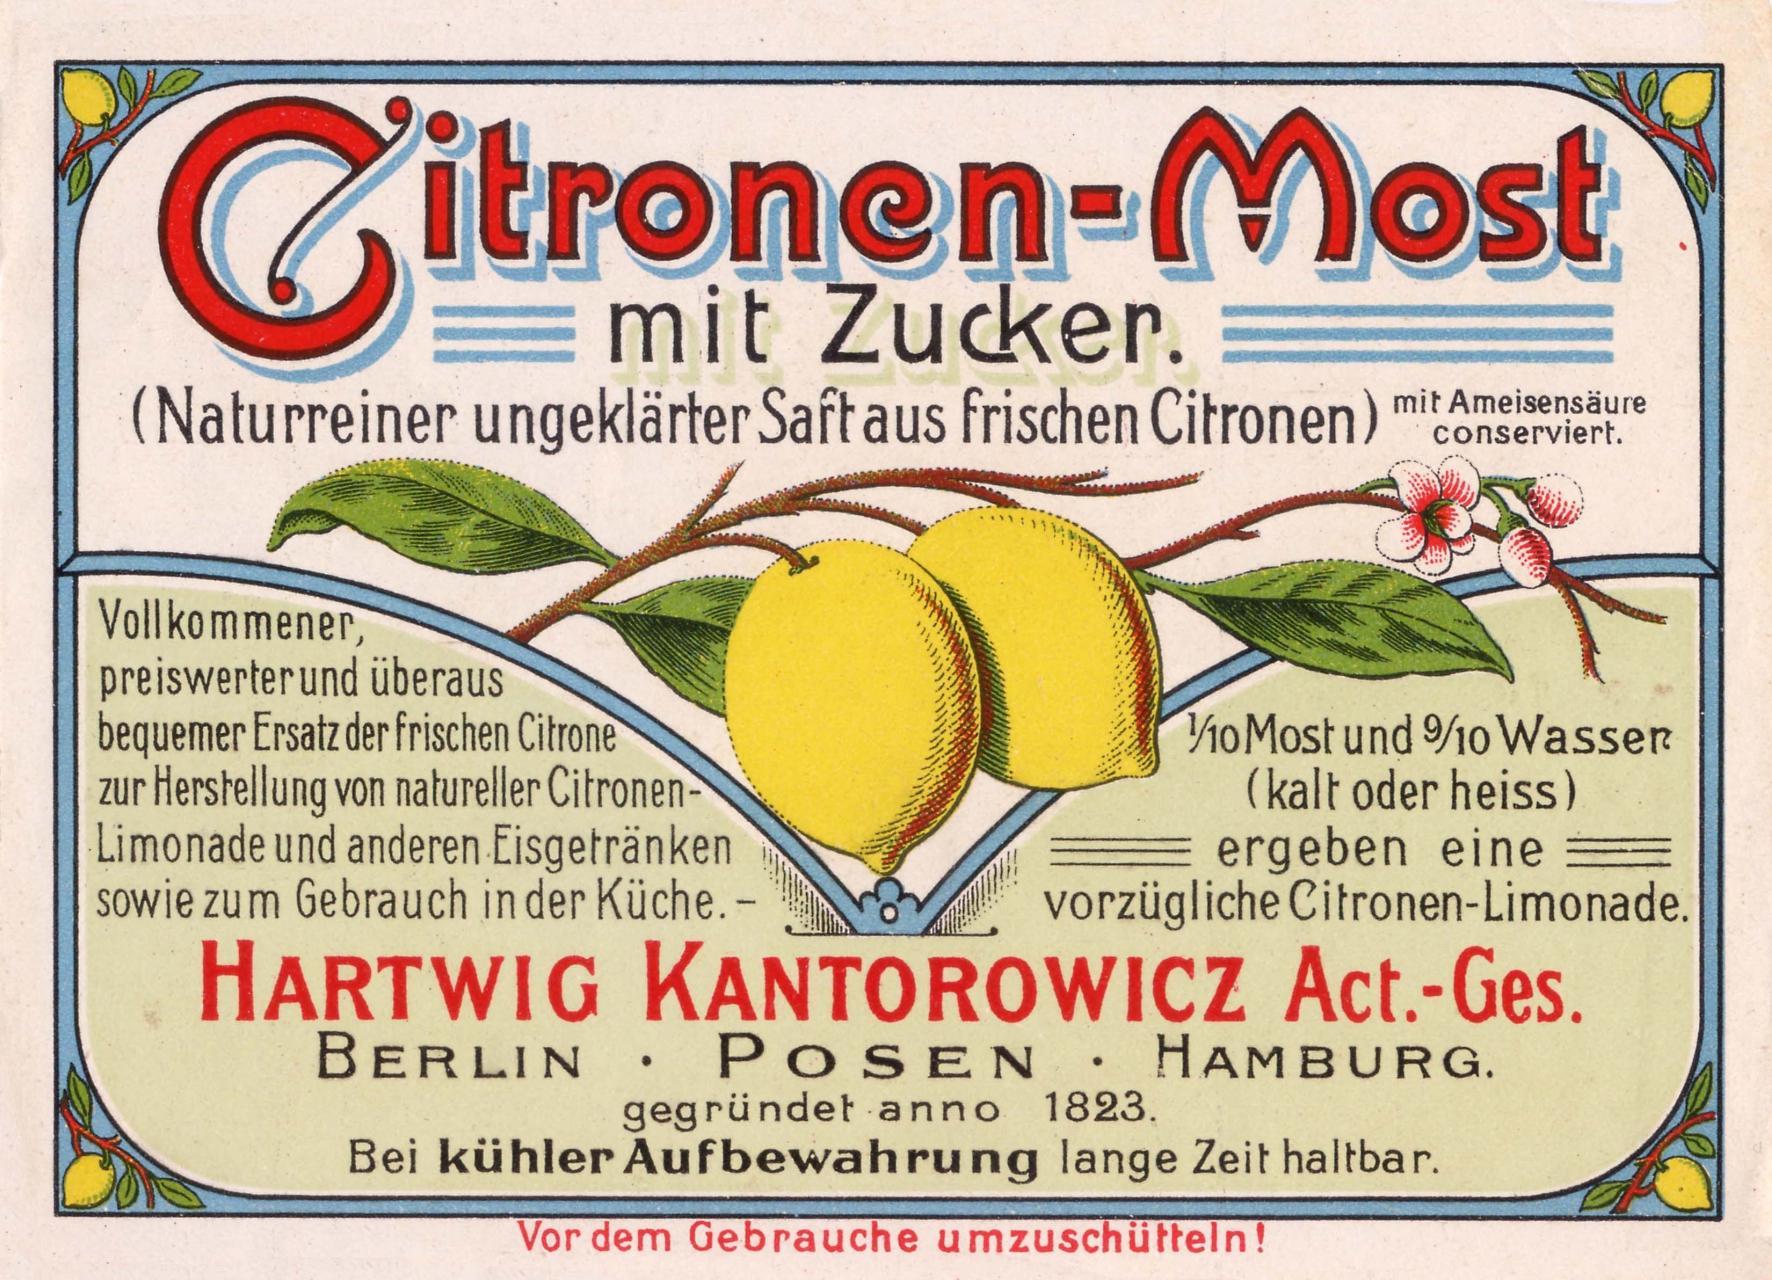 Etikett Citronenmost, © Stephan Becker, Brüssow